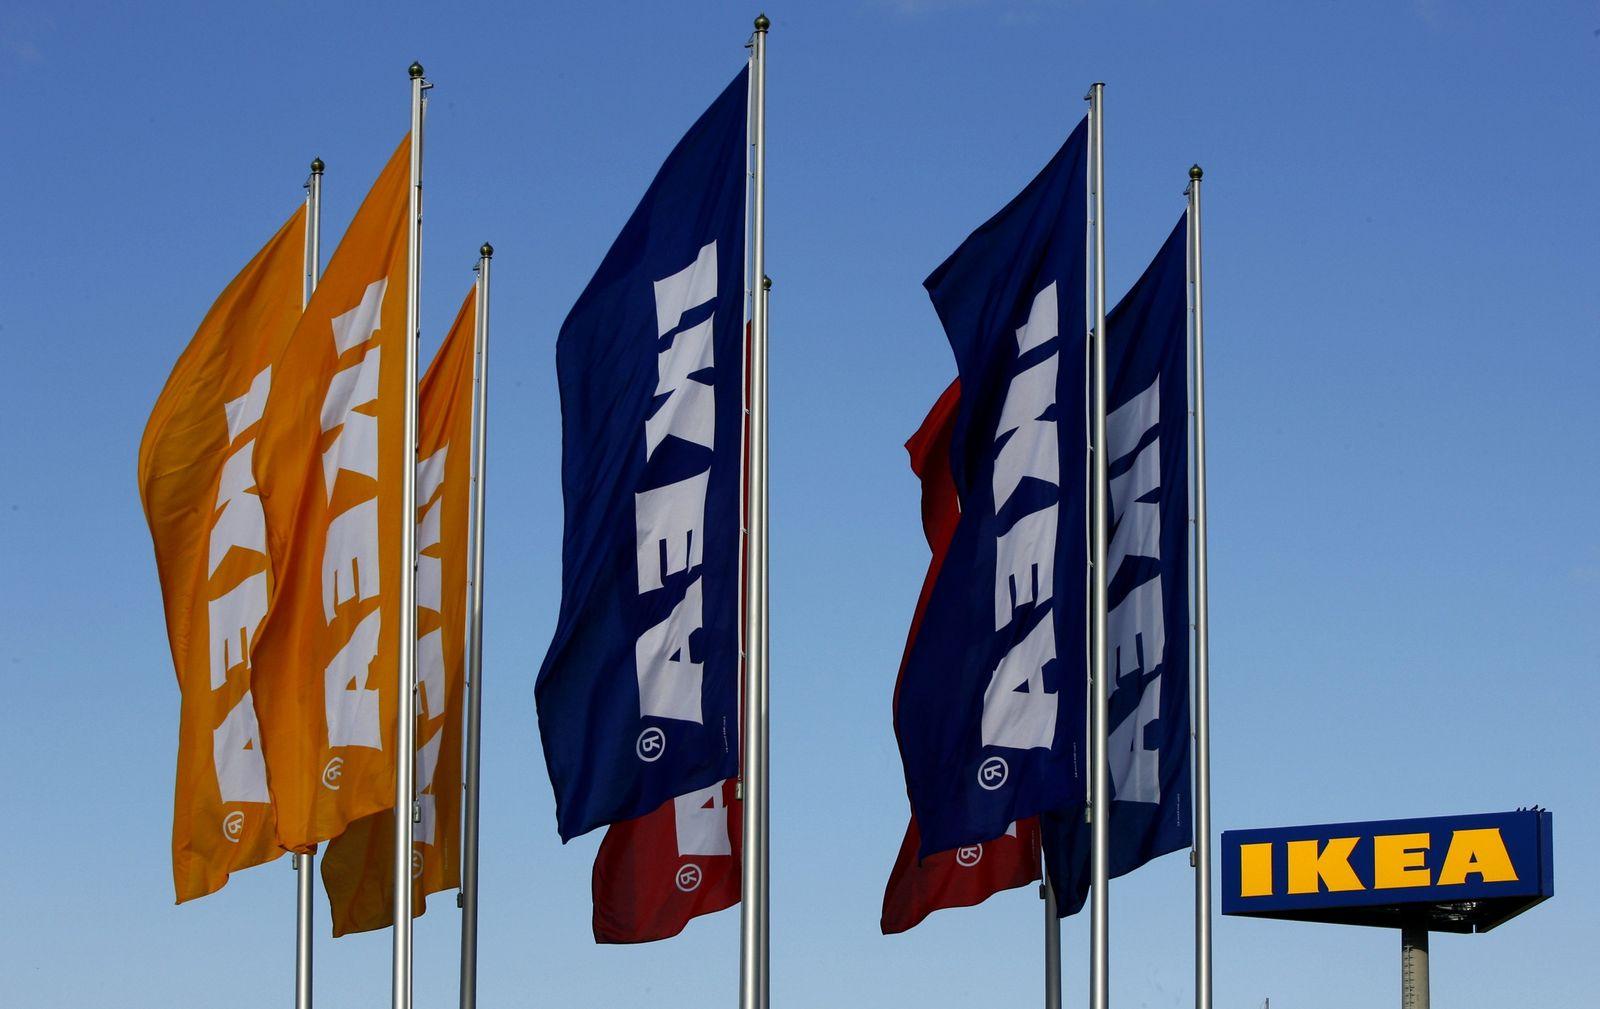 IKEA/